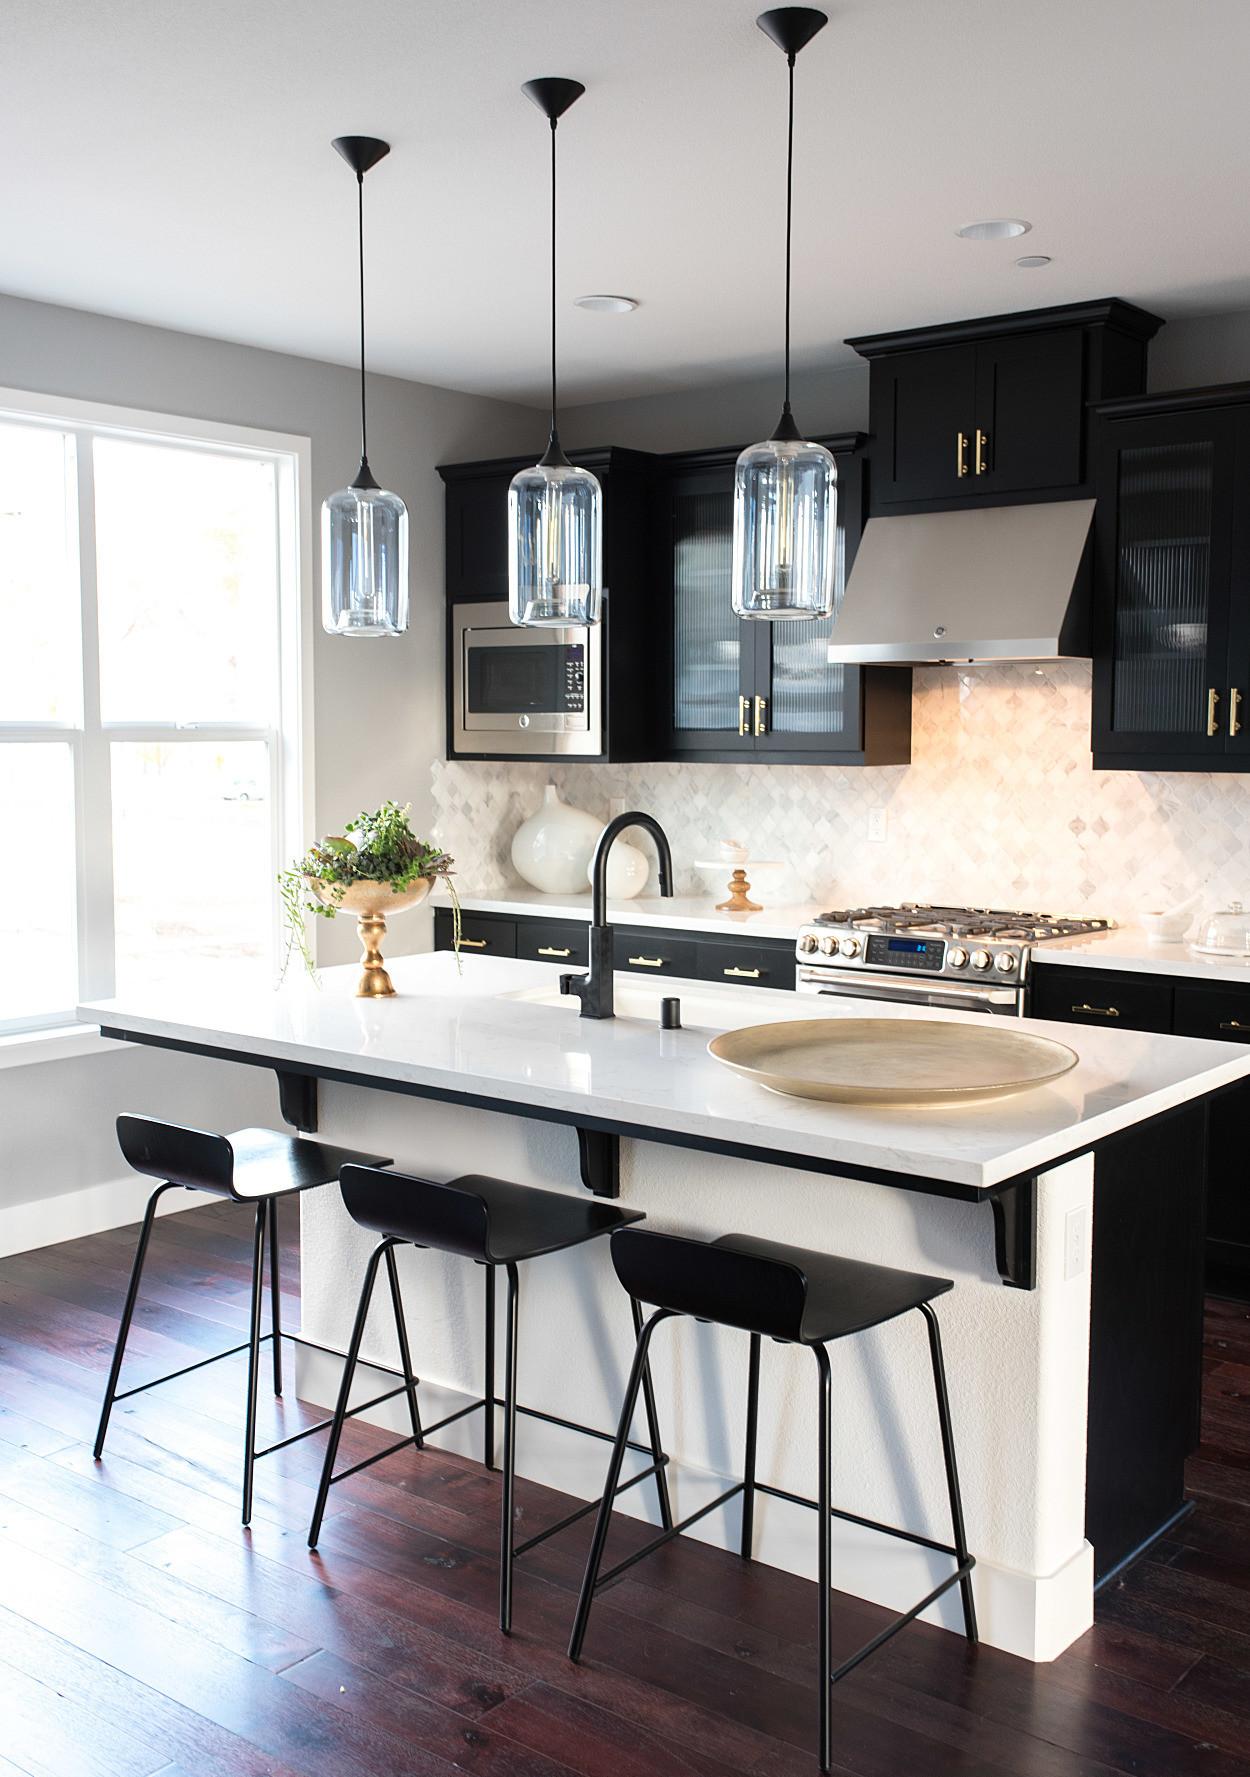 Kitchen Color Ideas. 3 Gorgeous Ways To Soften Black Kitchen Cabinets Color  Ideas E